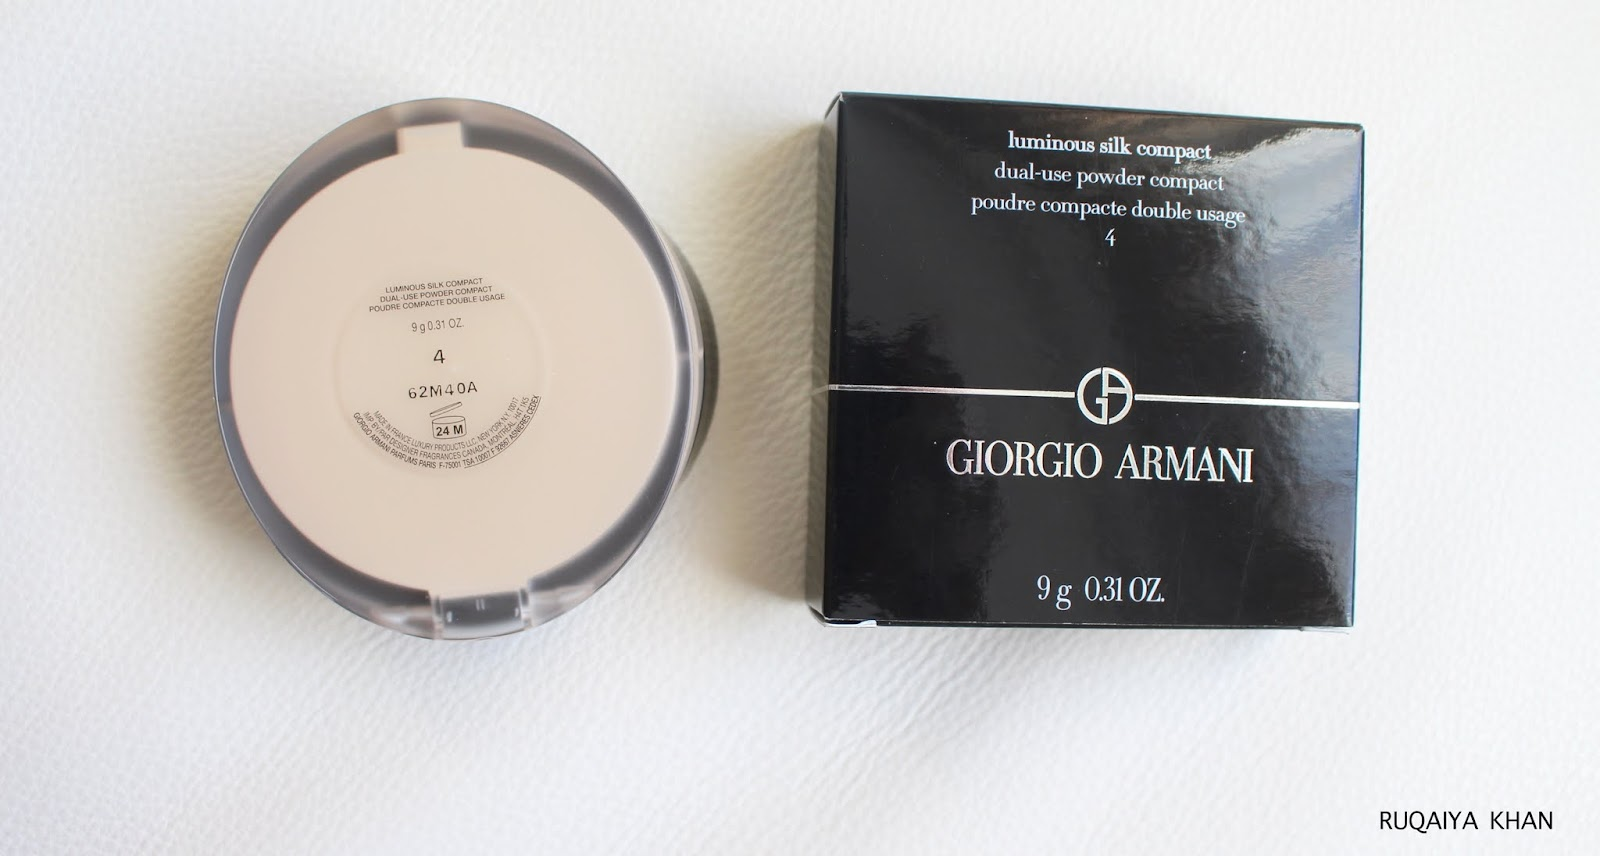 Ruqaiya Khan: Giorgio Armani Luminous Silk Powder Foundation in Shade 4 - Review